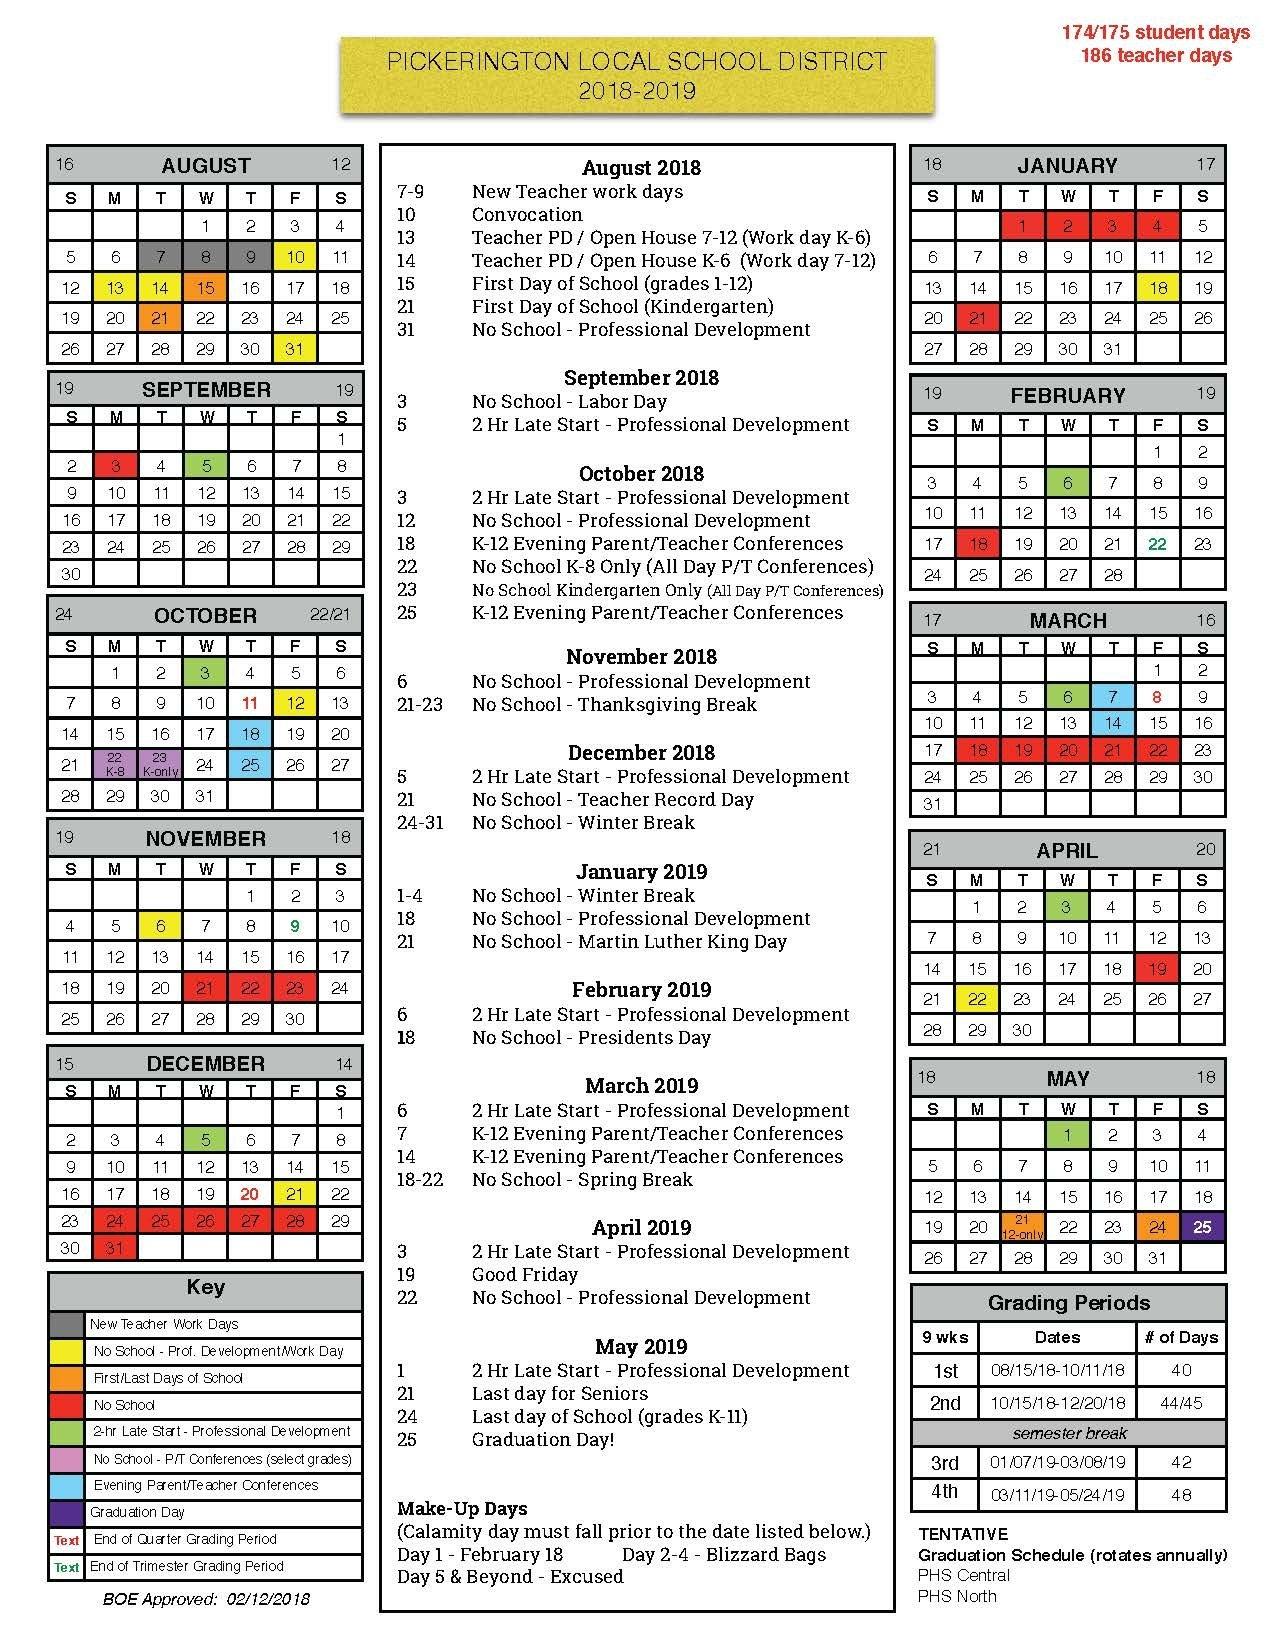 Board Of Education Approves 2018-19 Calendar - Pickerington Local School District 8 2019 Calendar